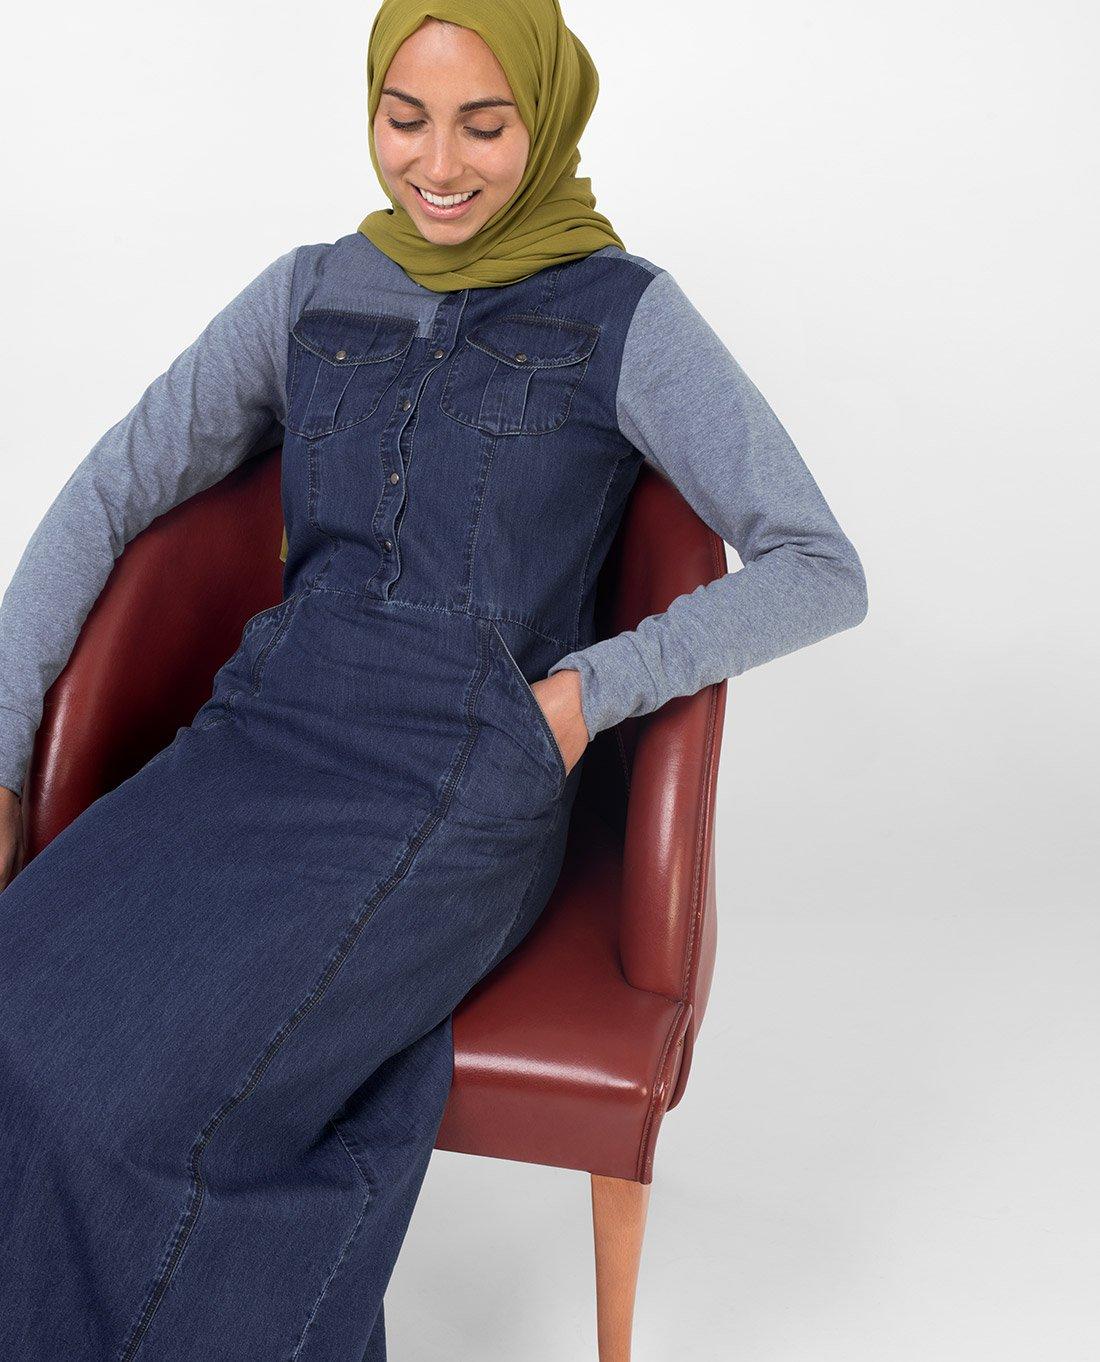 Silk Route Grey Contrast Fine Denim Maxi Dress Jilbab Medium 56 by Silk Route (Image #2)